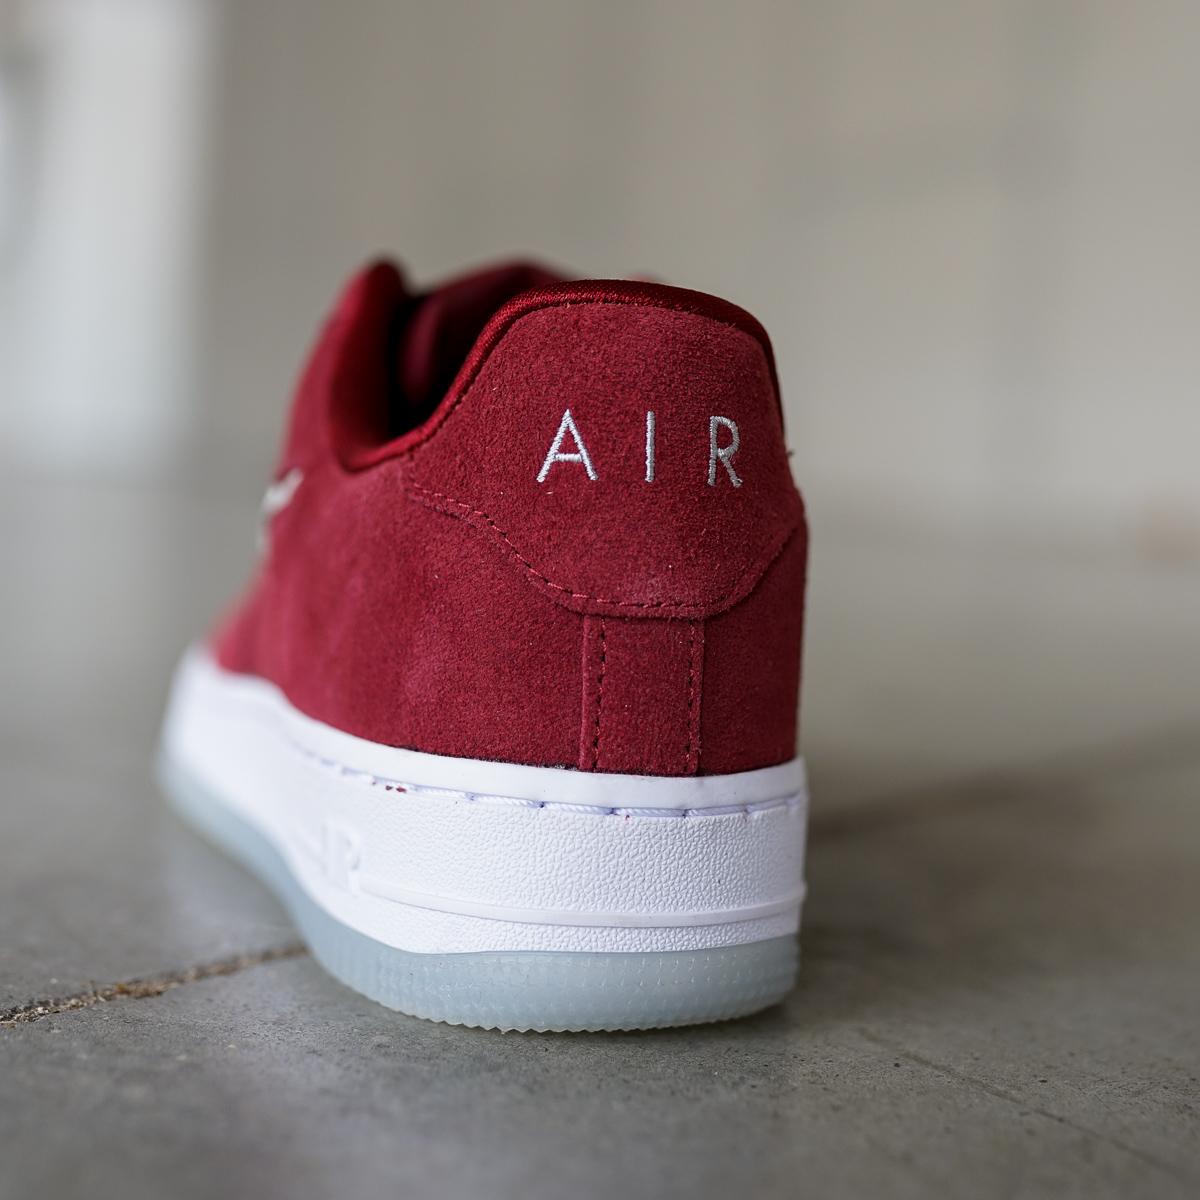 Air W Force 1 Nike Lx Low Prm lJFK1c